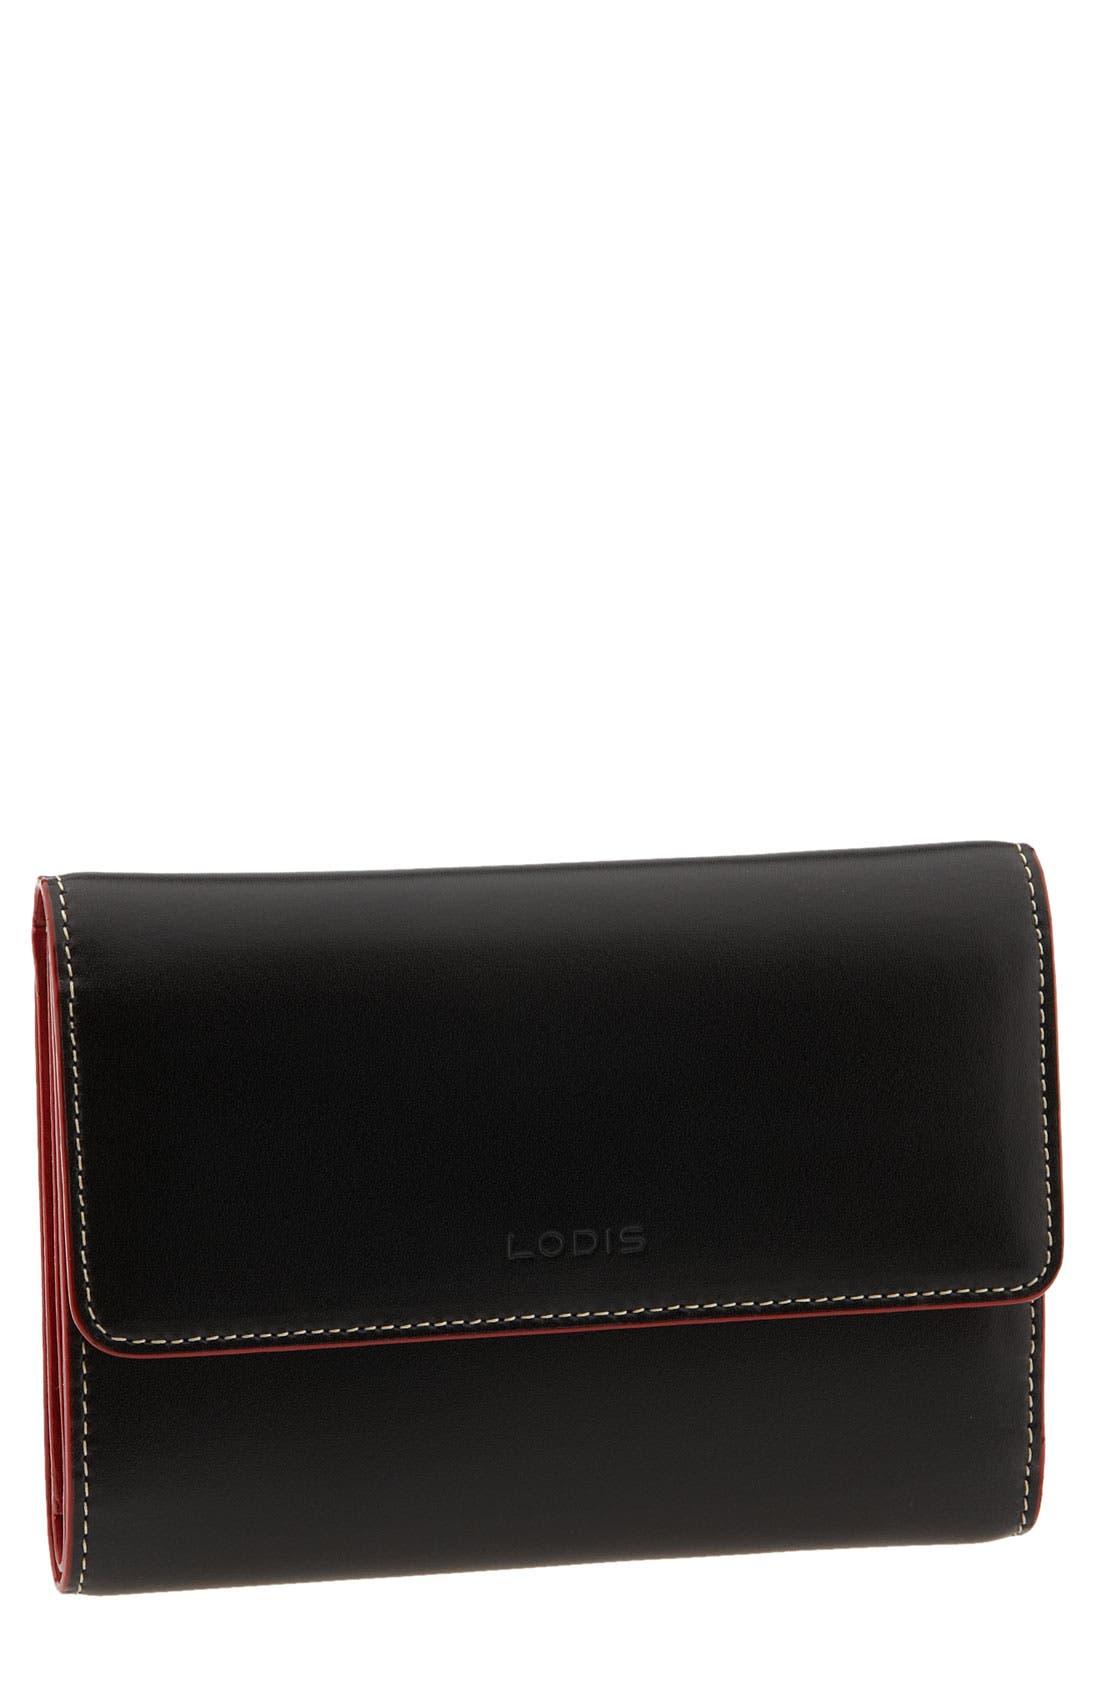 Lodis 'Audrey' Continental Wallet, Main, color, 002